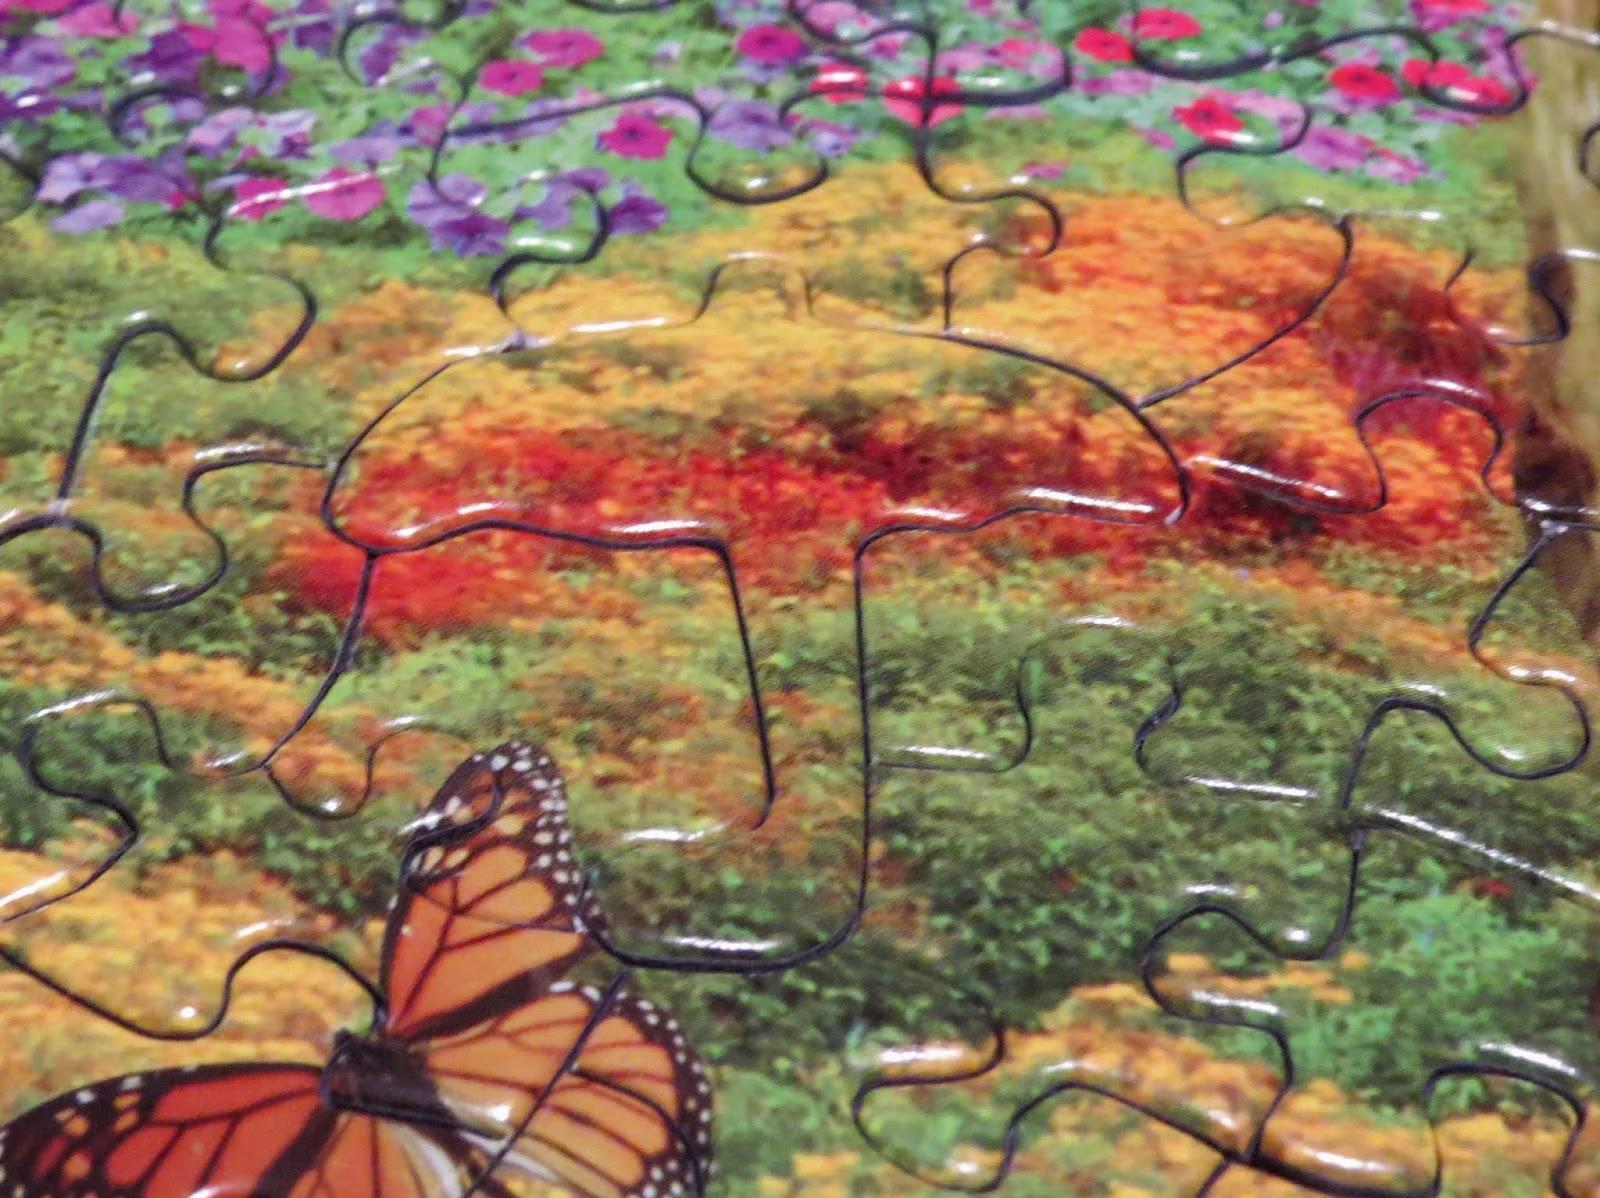 jigsaw puzzle piece shaped like an umbrella